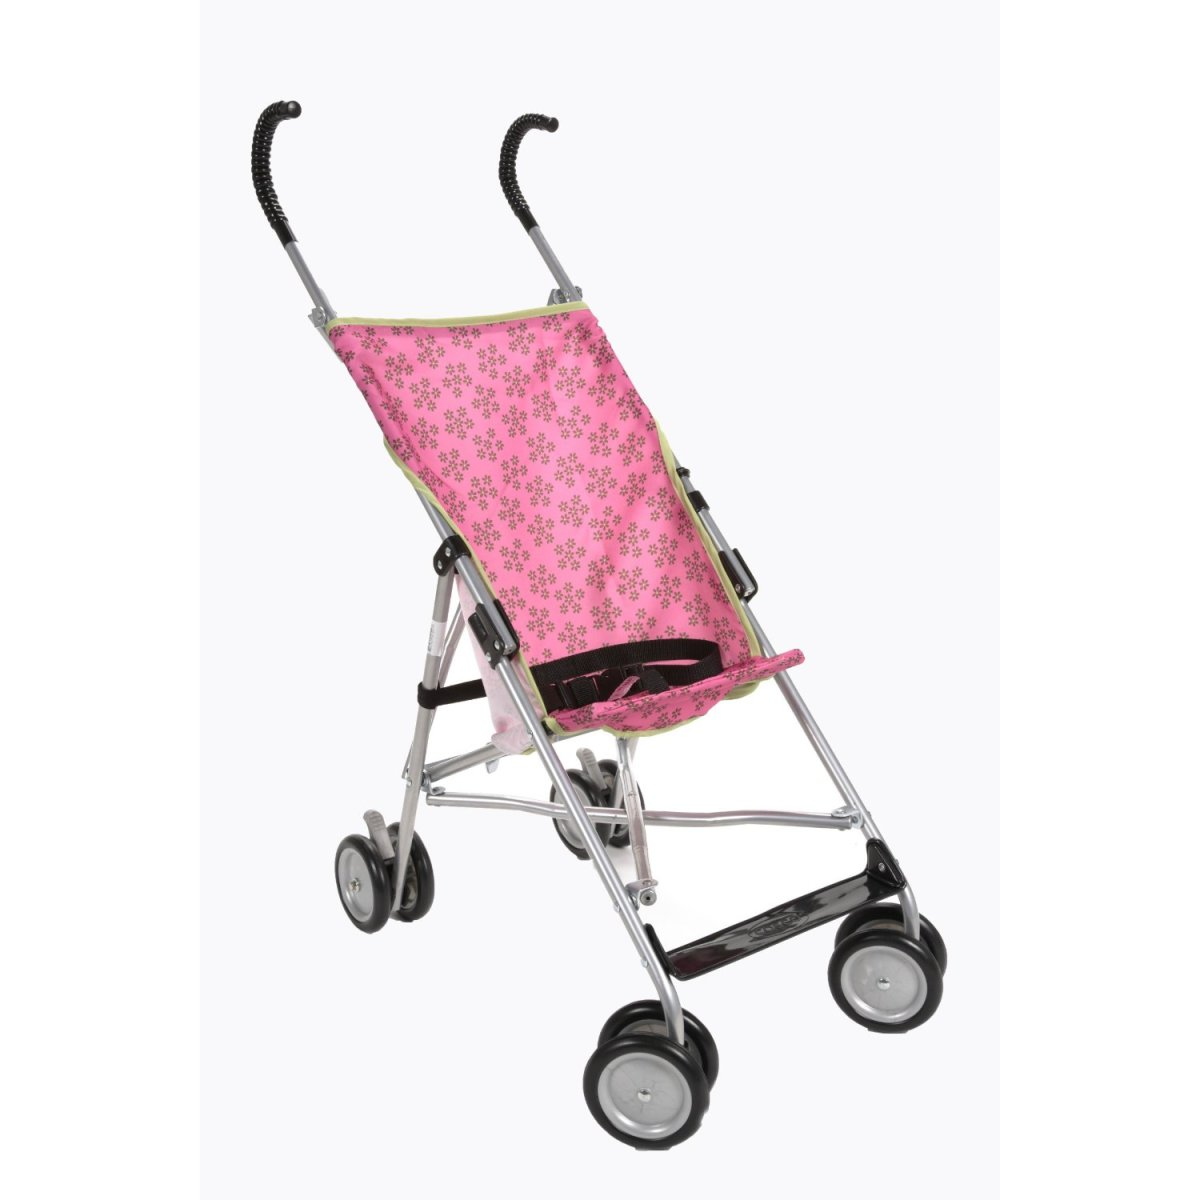 Cosco Umbrella Stroller Nicola